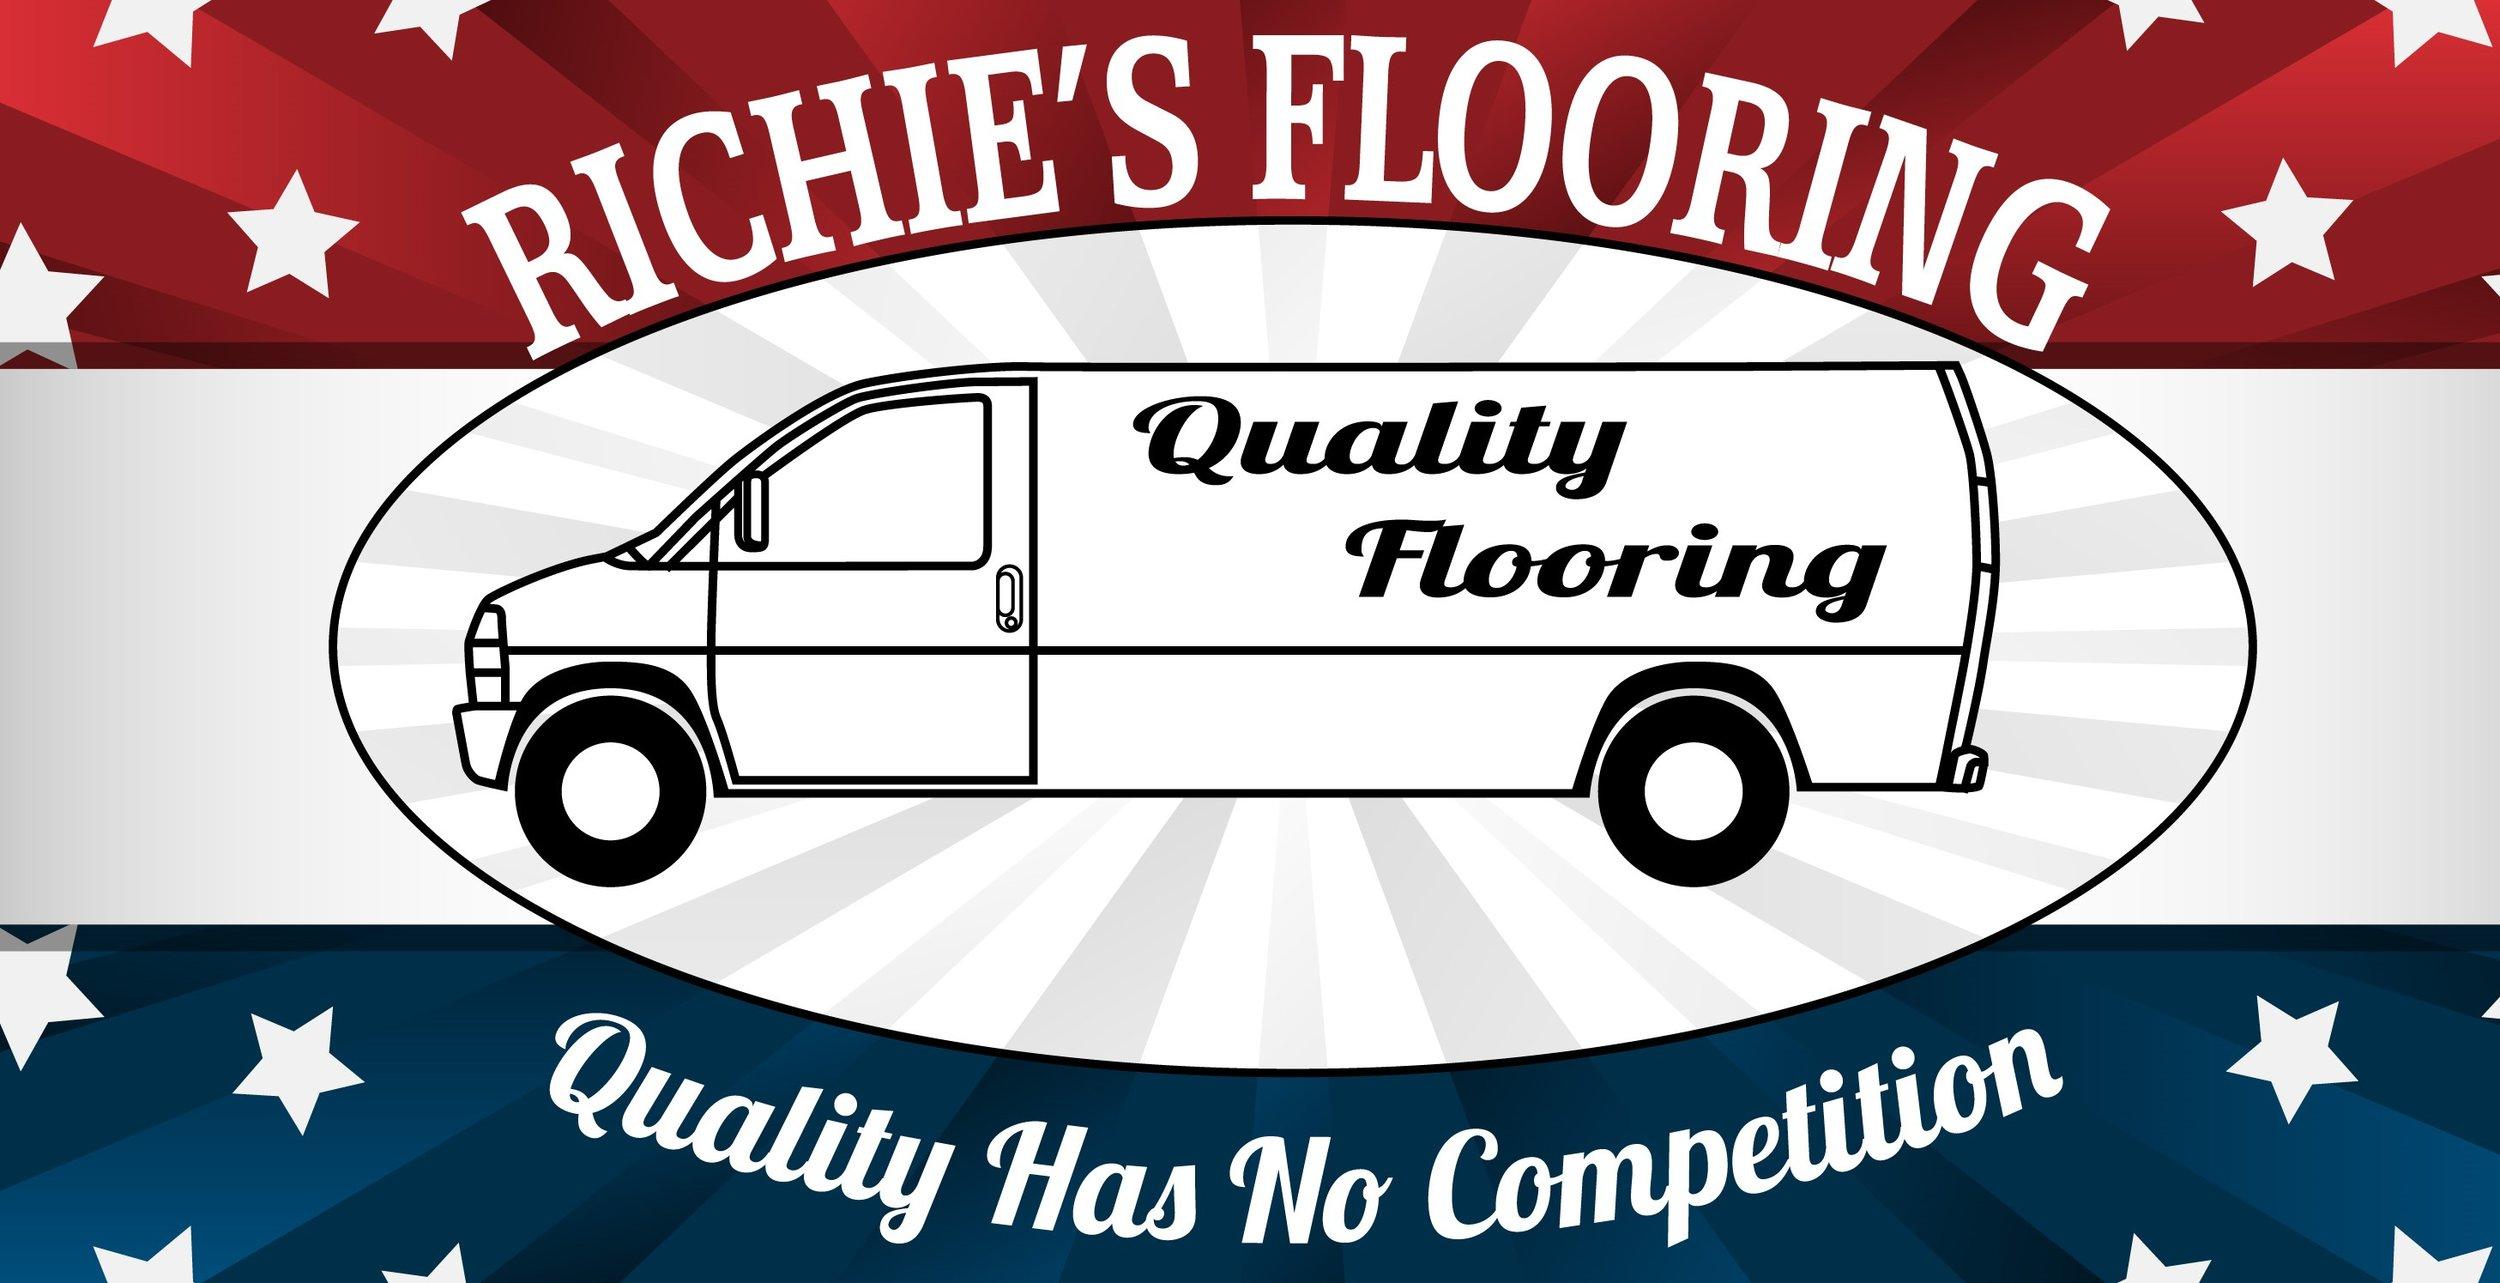 Richies Flooring - New Logo.jpg